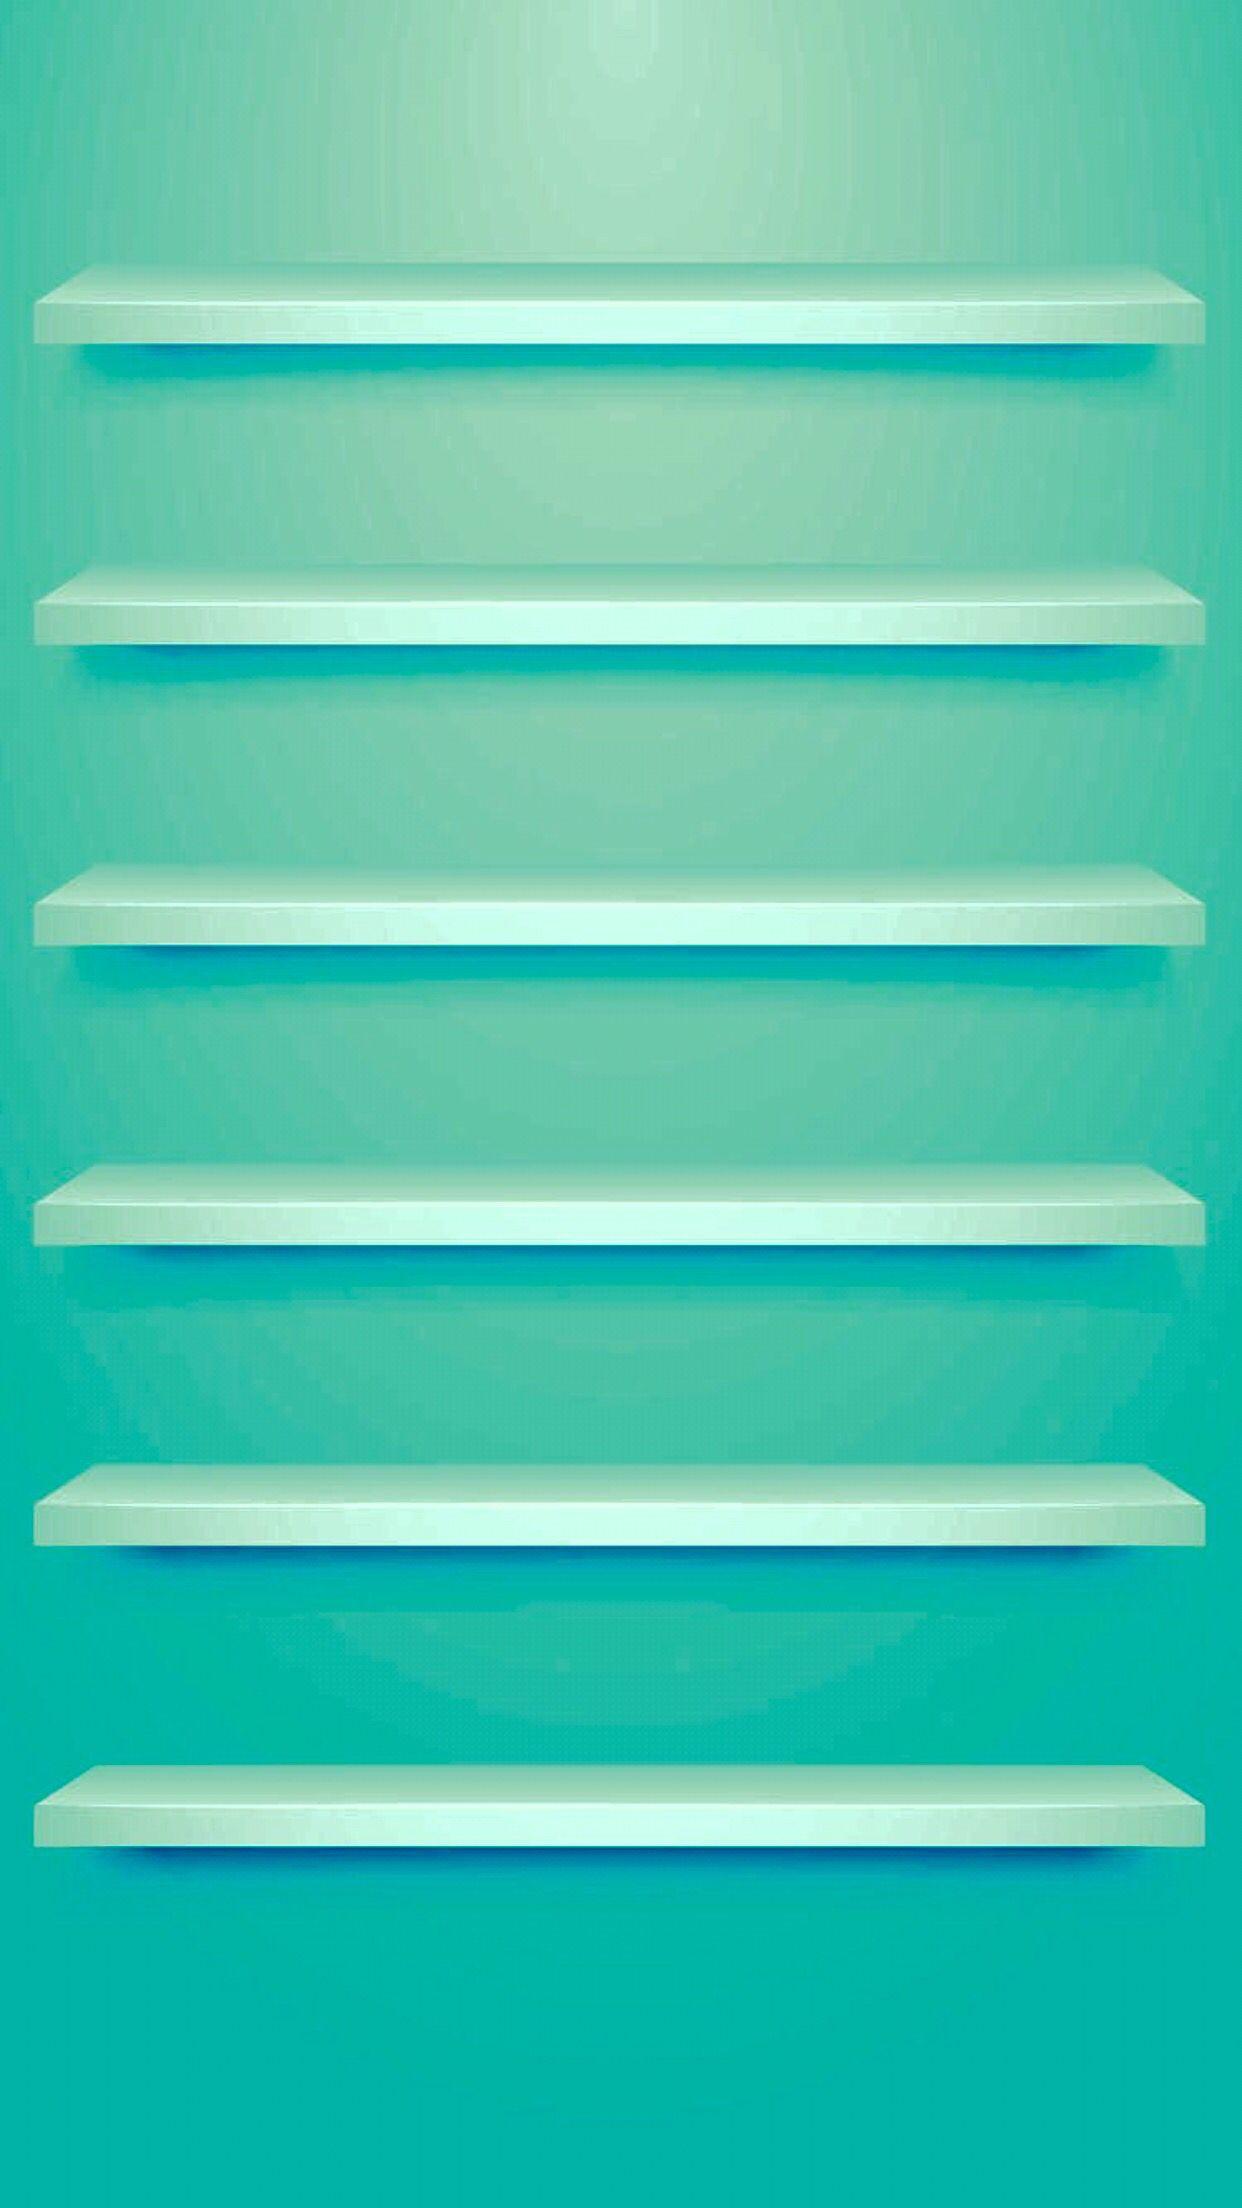 Tiffany Shave Iphone 6s Plus 壁紙 本棚 Iphone7plus 壁紙 Iphone 用壁紙